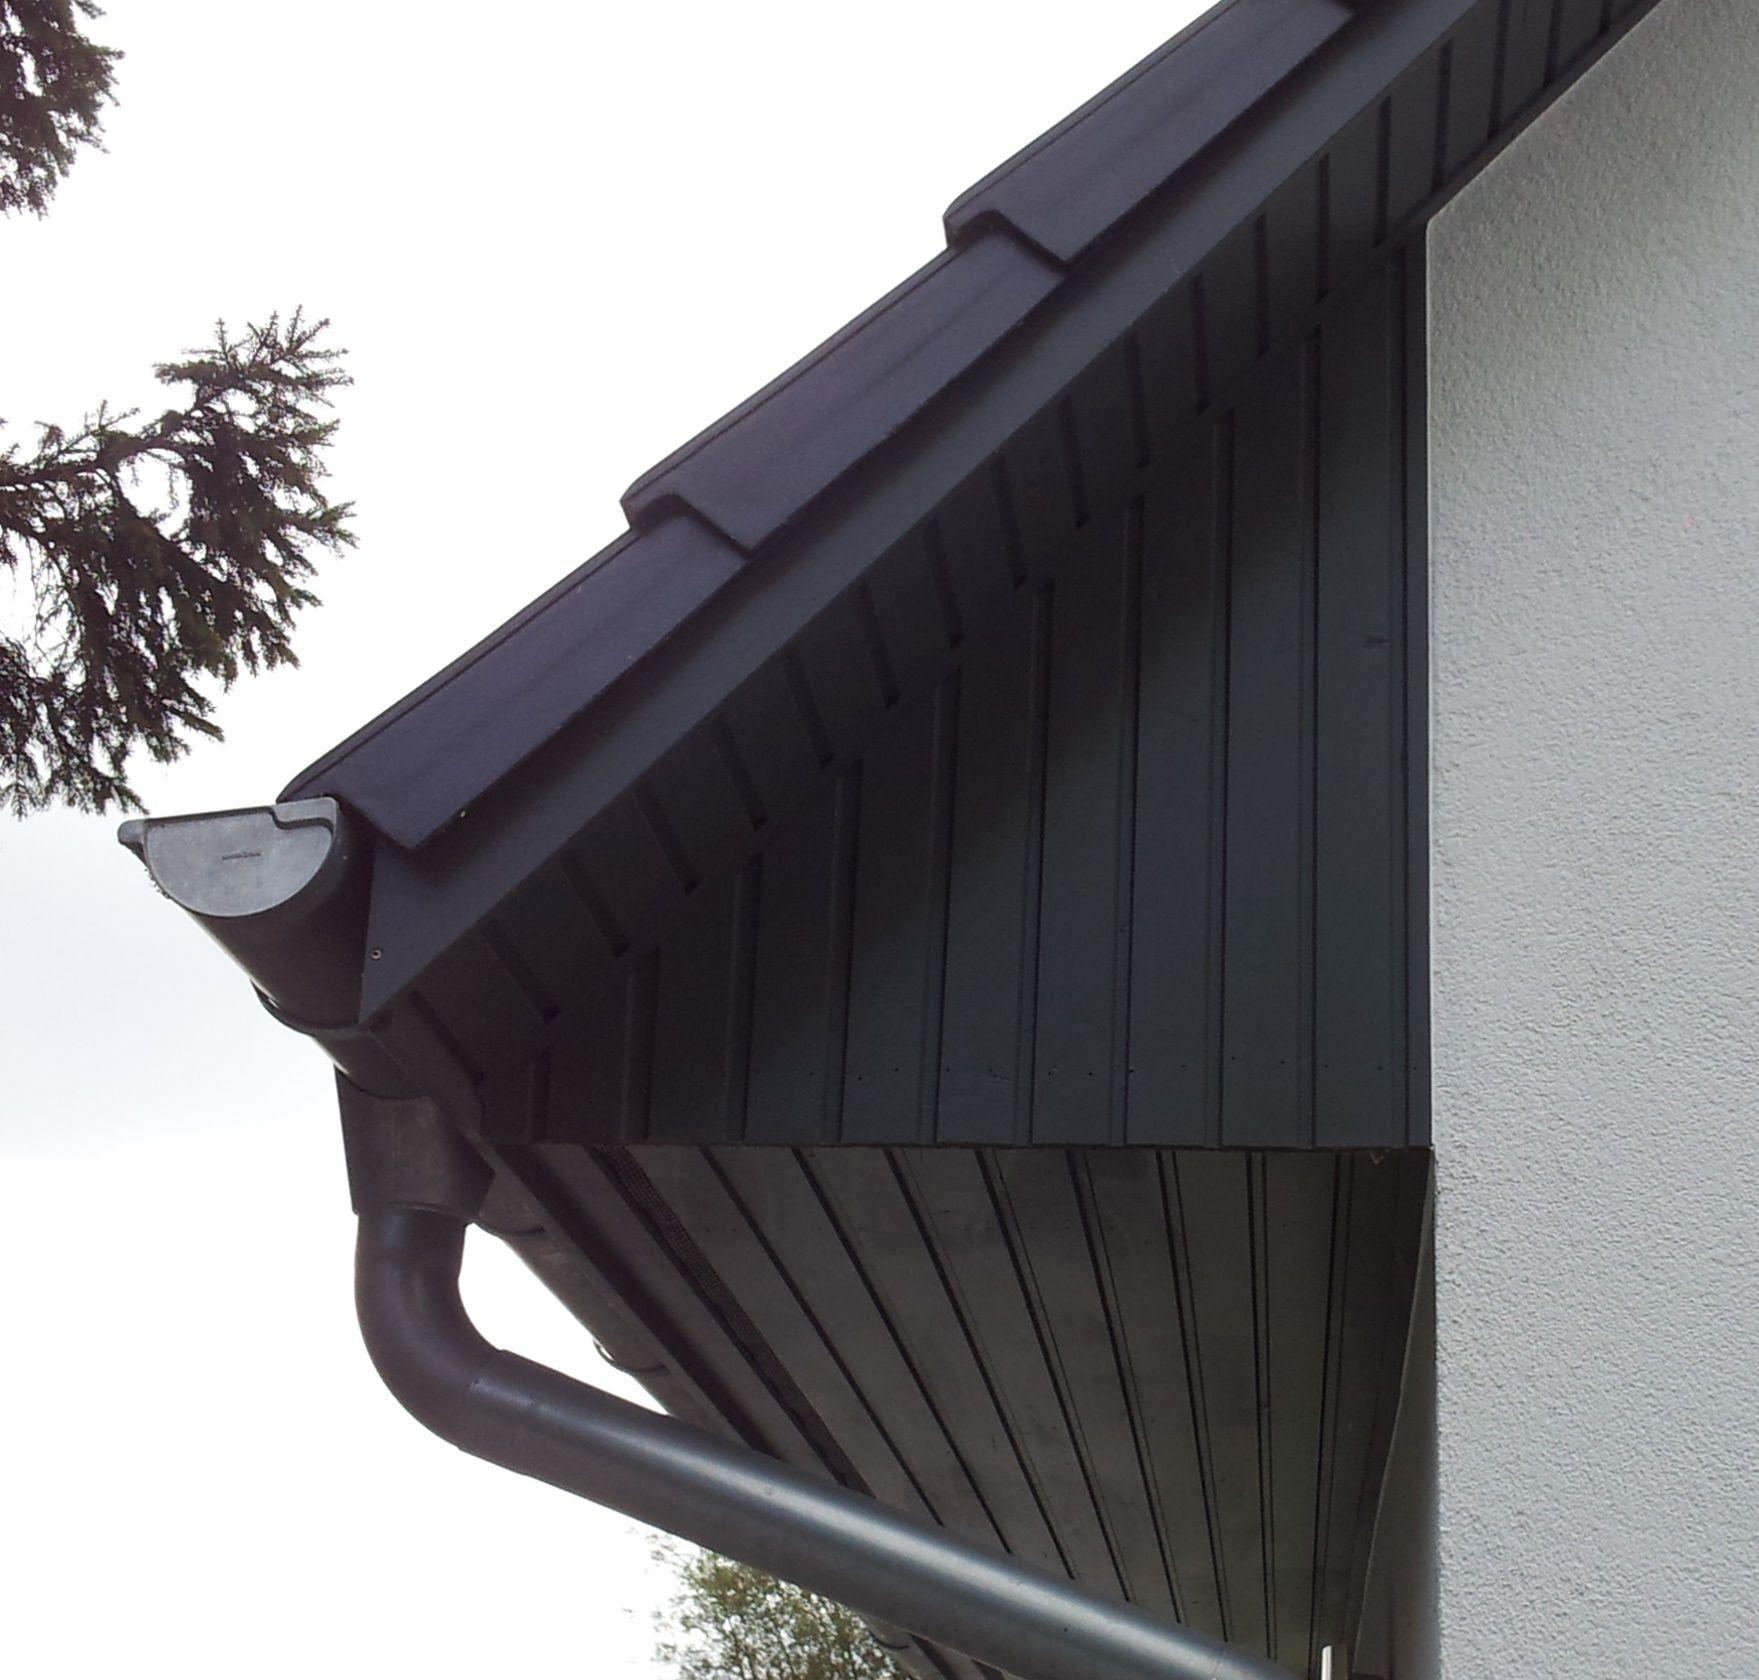 Berühmt Dachkasten   Dachkasten   Dachkasten und Haus DP31